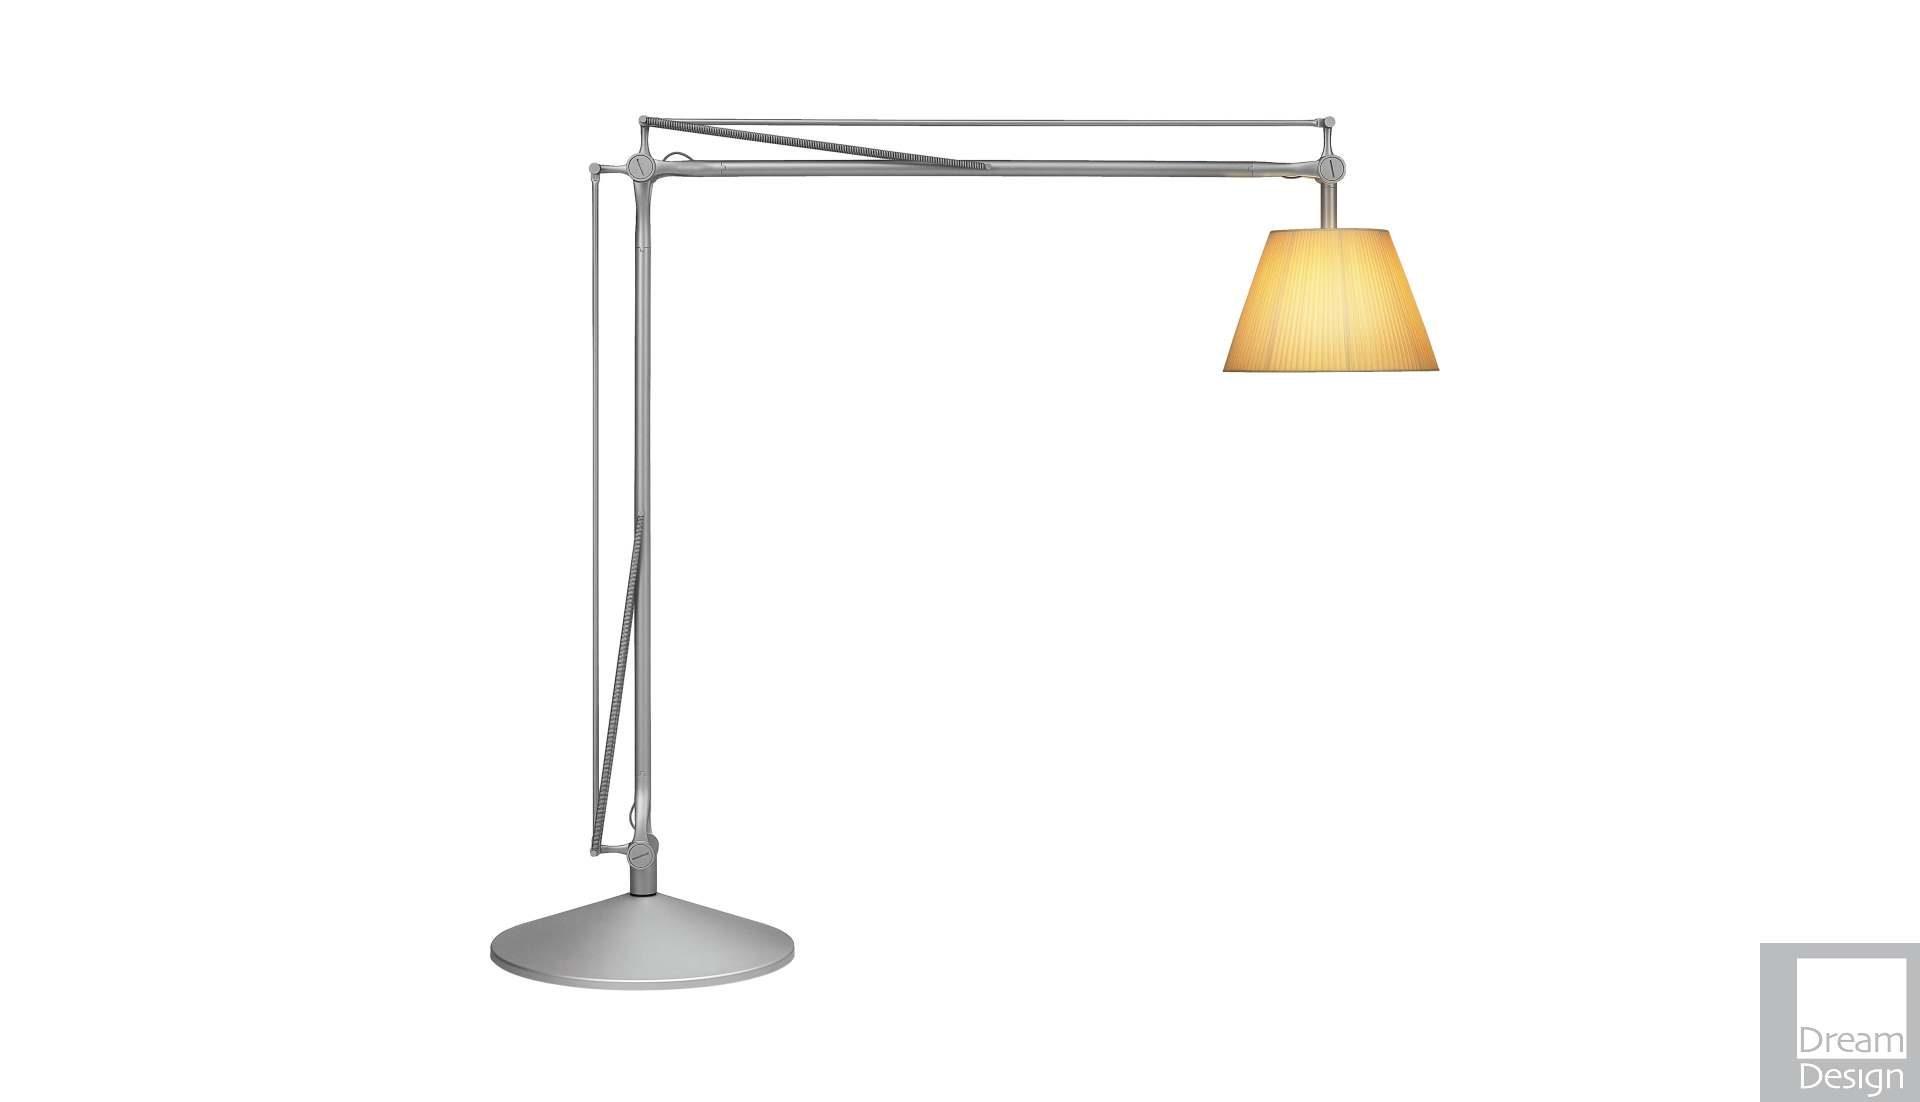 Flos Superarchimoon Floor Lamp designed by Philippe Starck